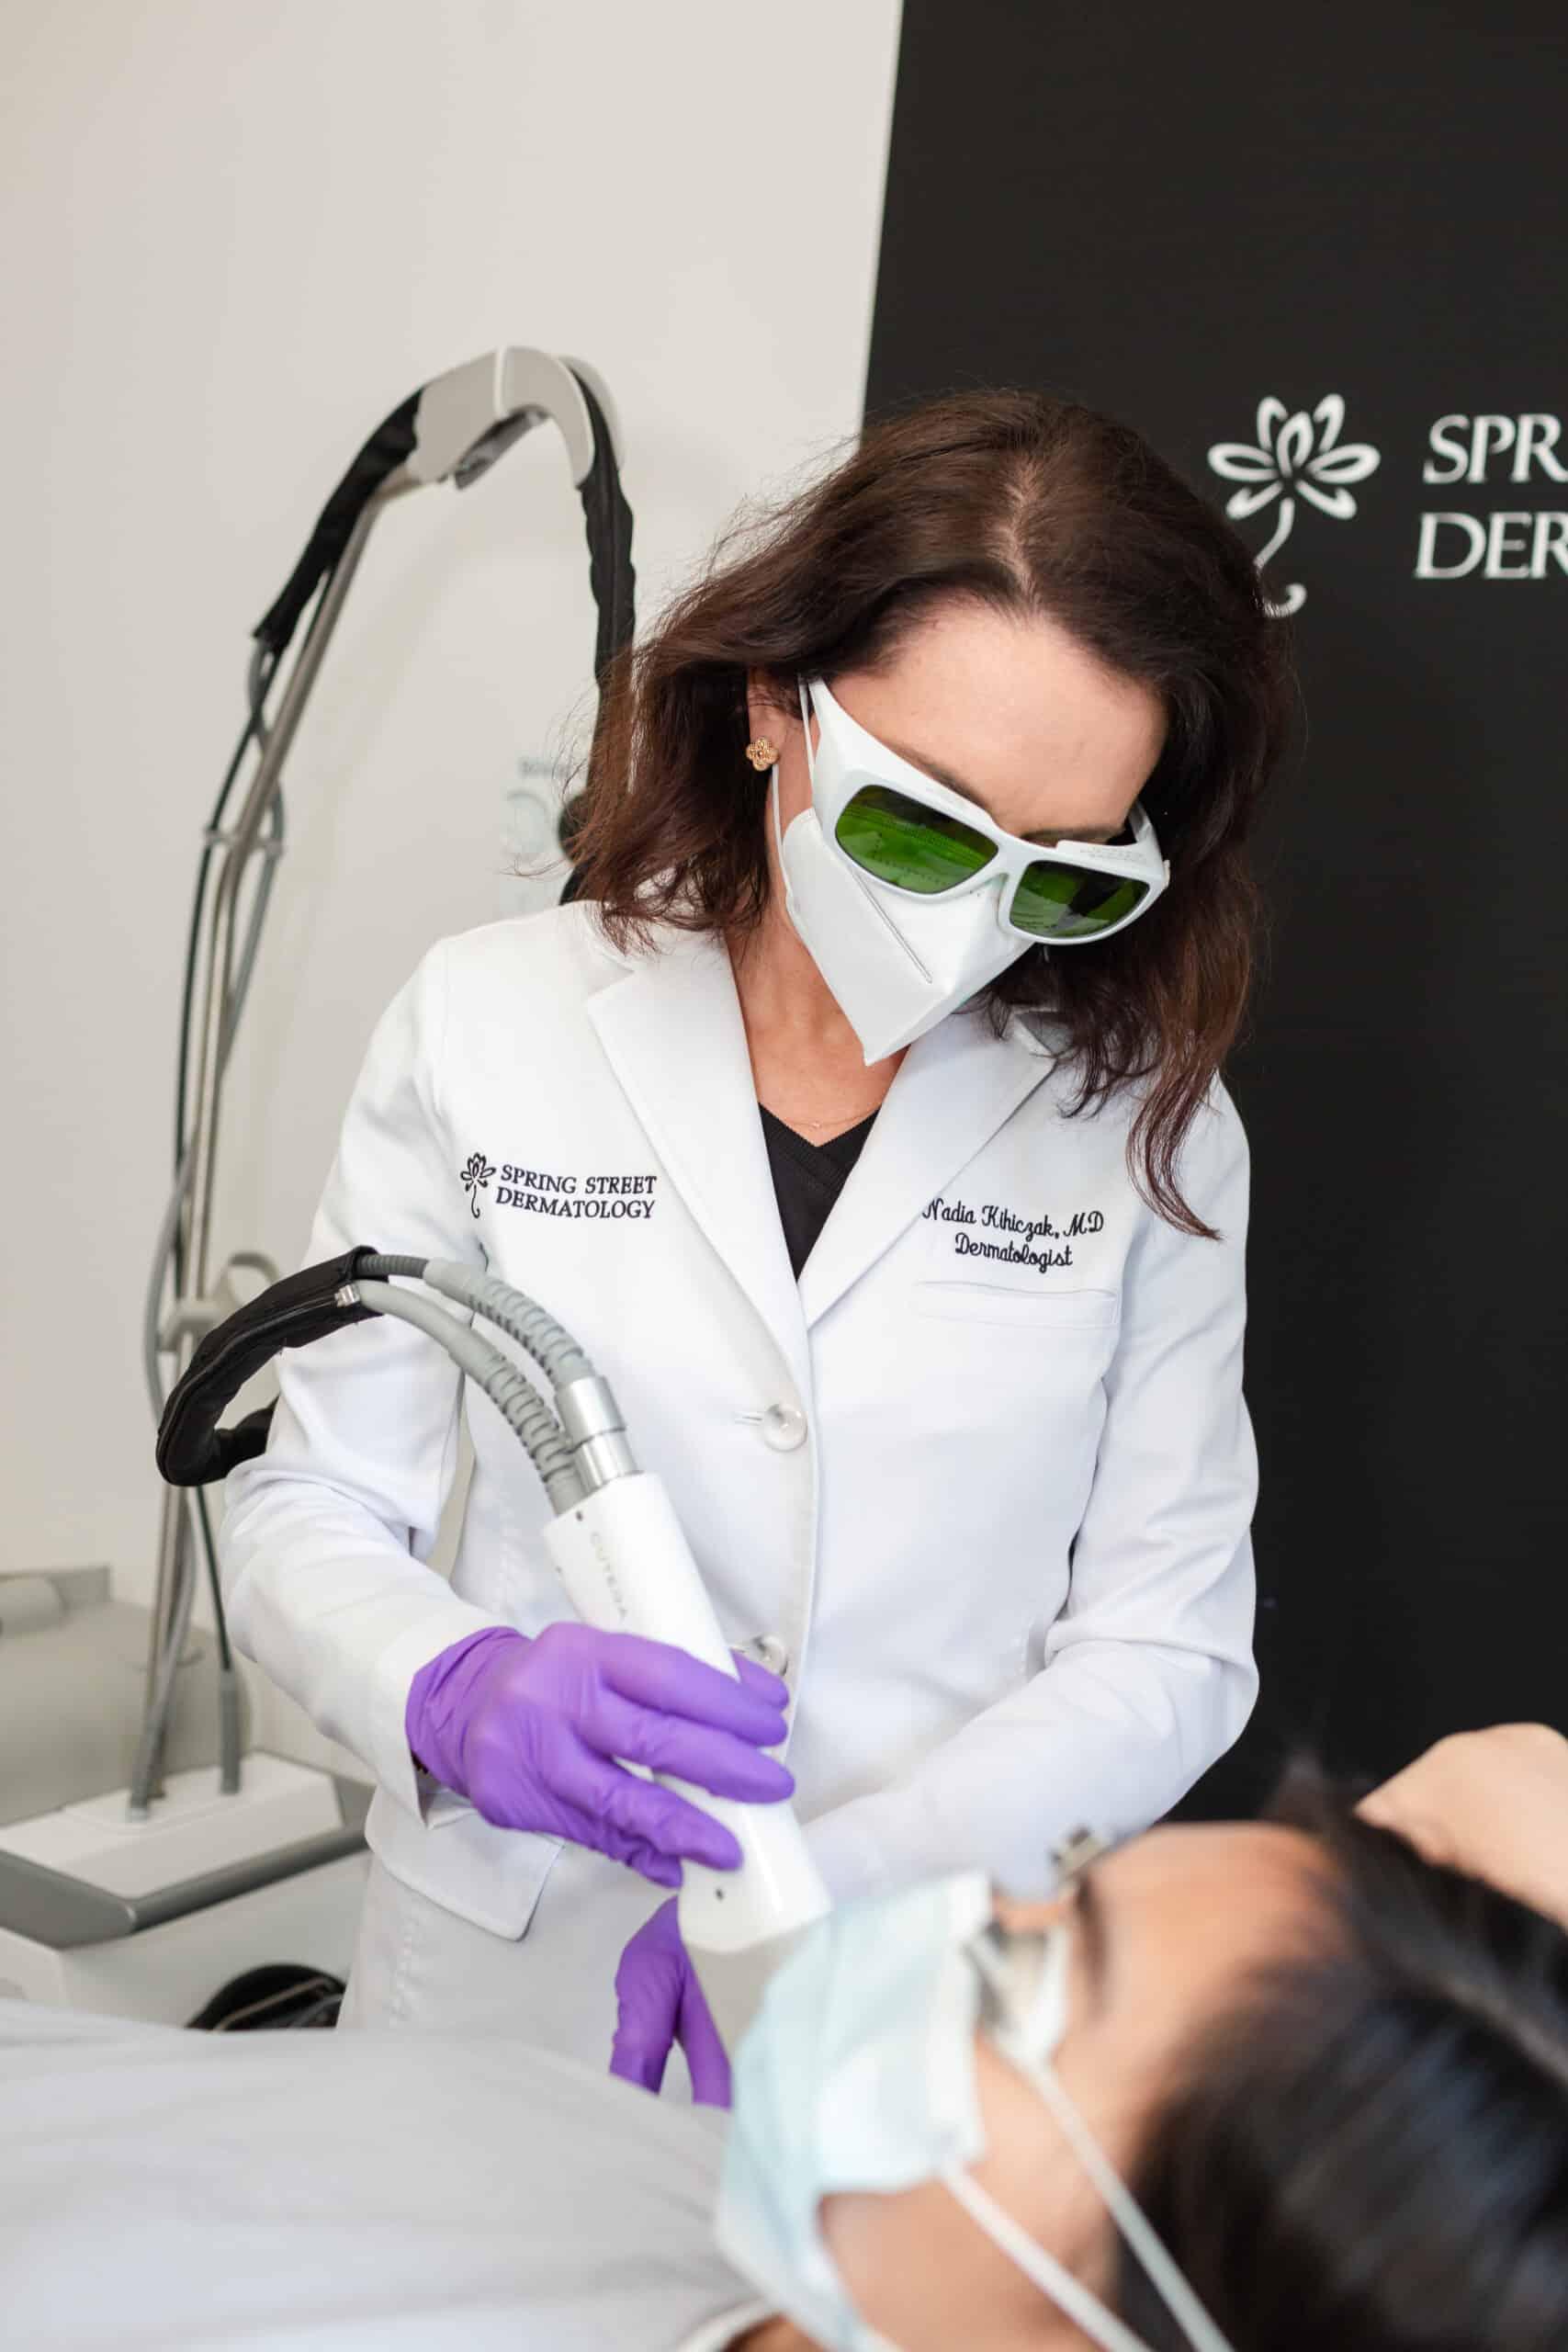 NYC dermatologist, Dr. Nadia Kihiczak